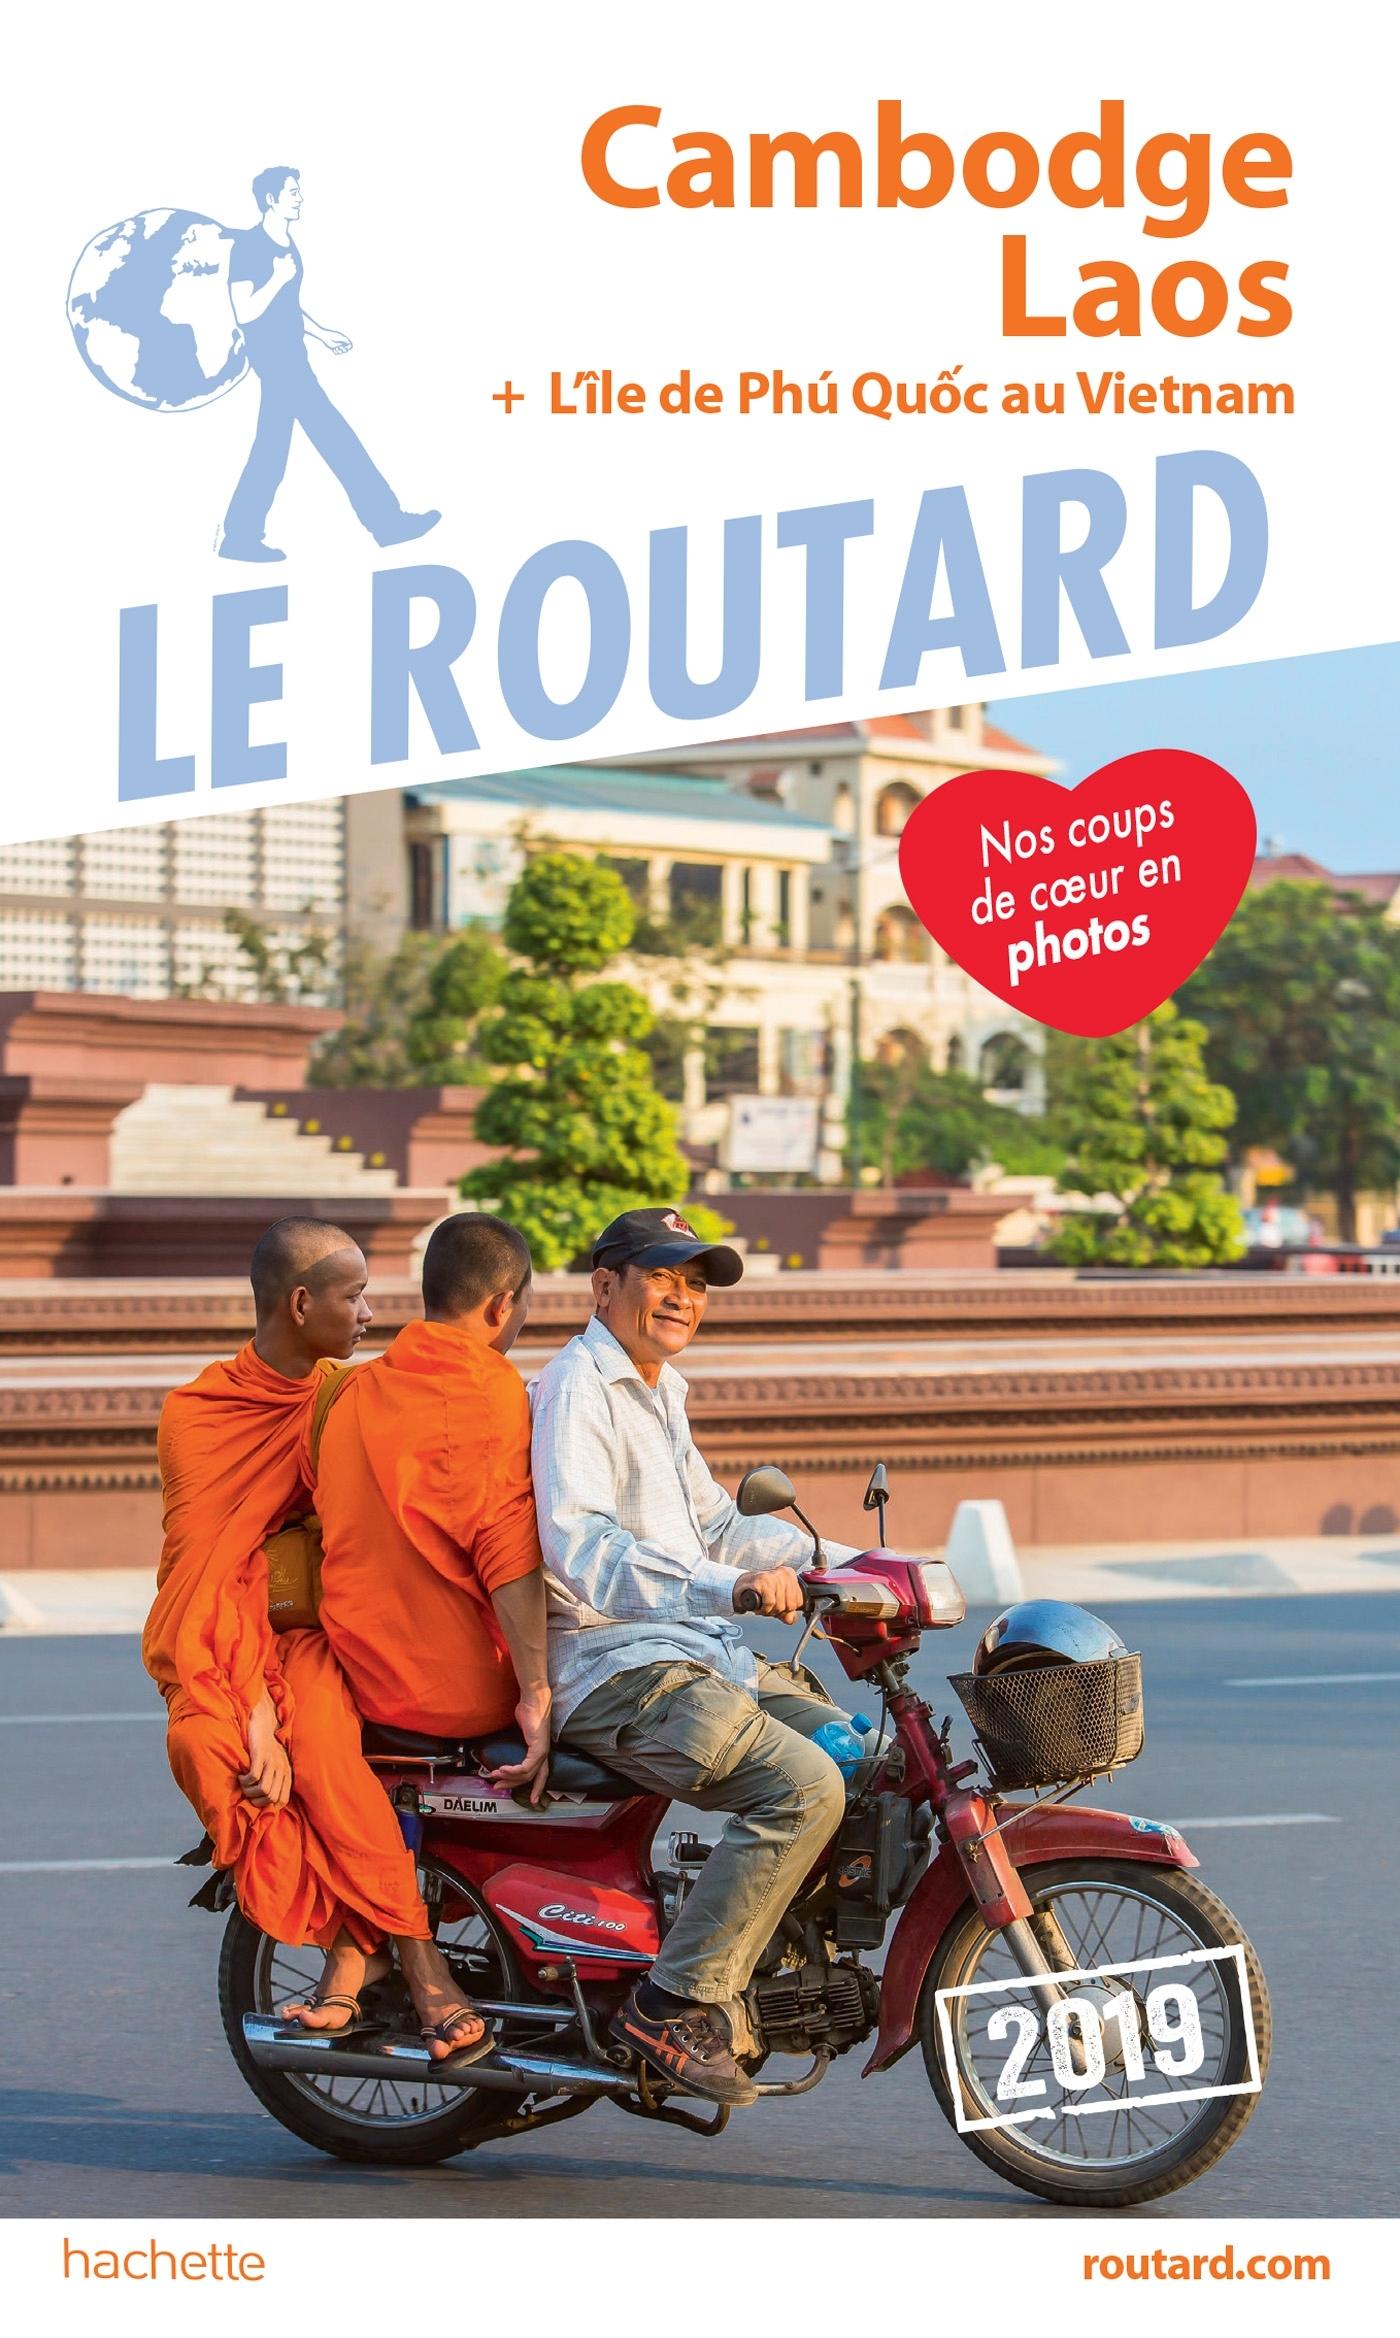 GUIDE DU ROUTARD CAMBODGE, LAOS 2019 - + L'ILE DE PHU QUOC AU VIETNAM